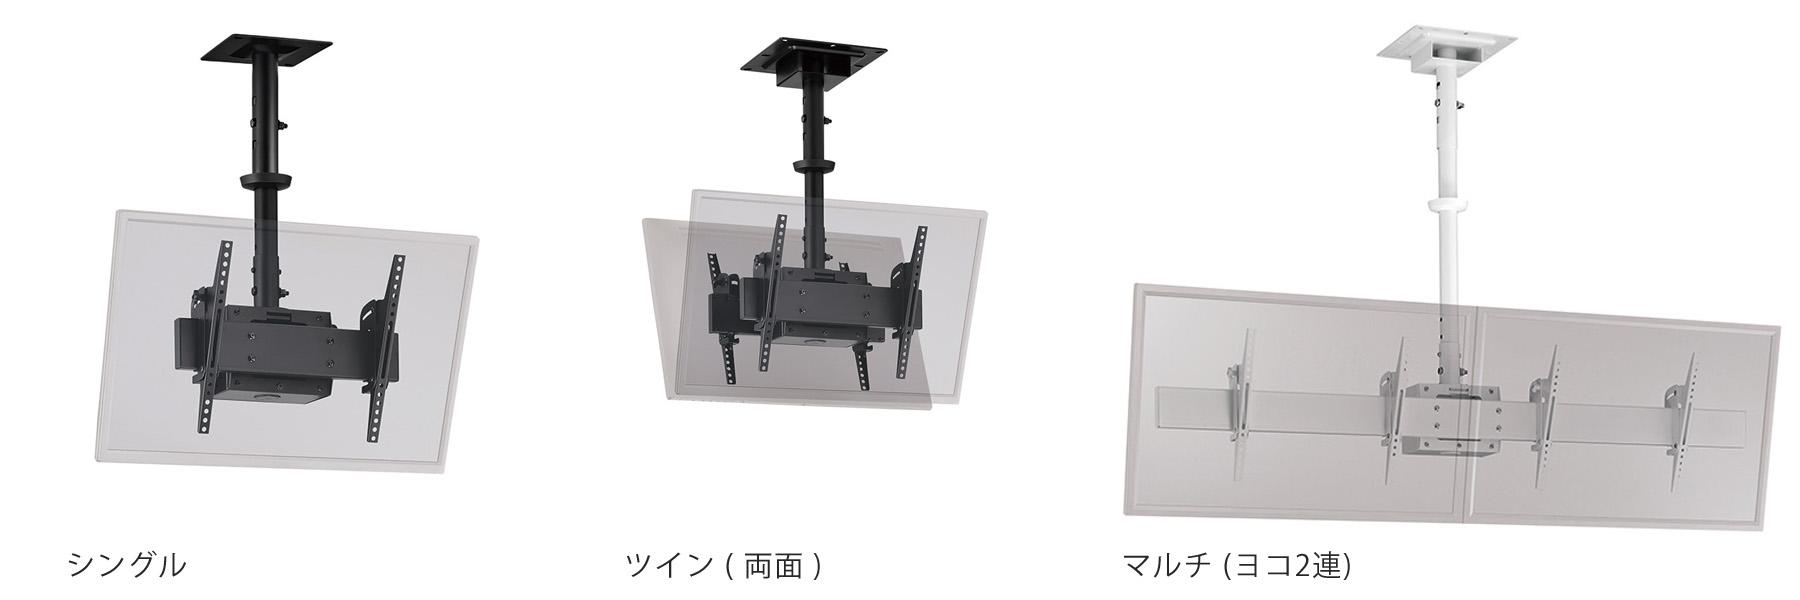 HAMILeX 業務用製品 CH series  新発売